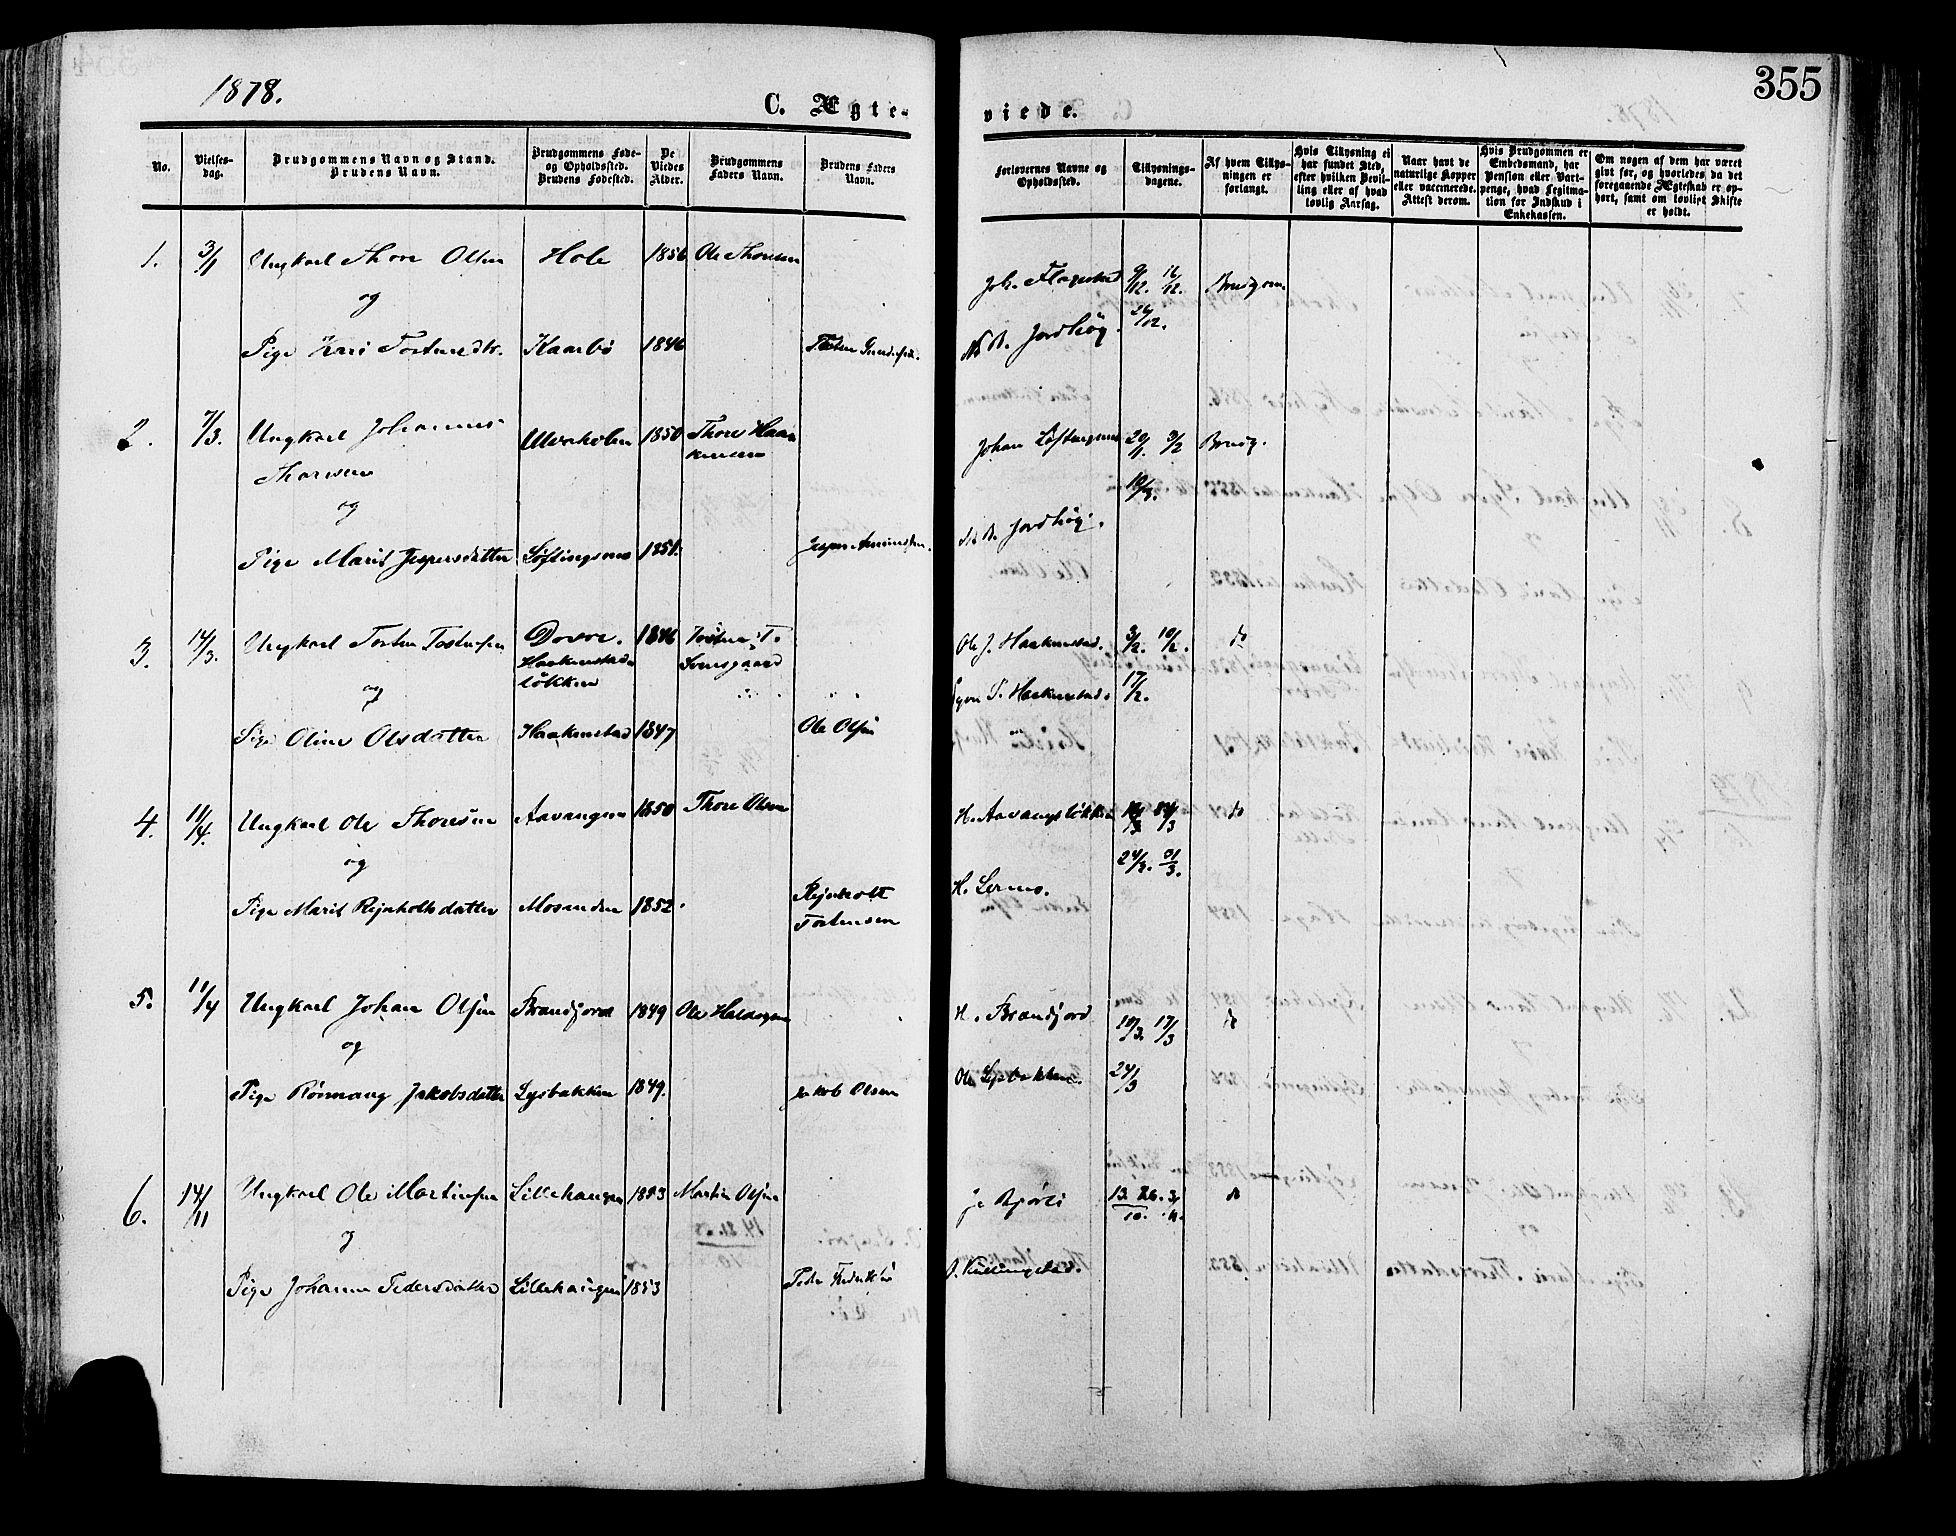 SAH, Lesja prestekontor, Ministerialbok nr. 8, 1854-1880, s. 355